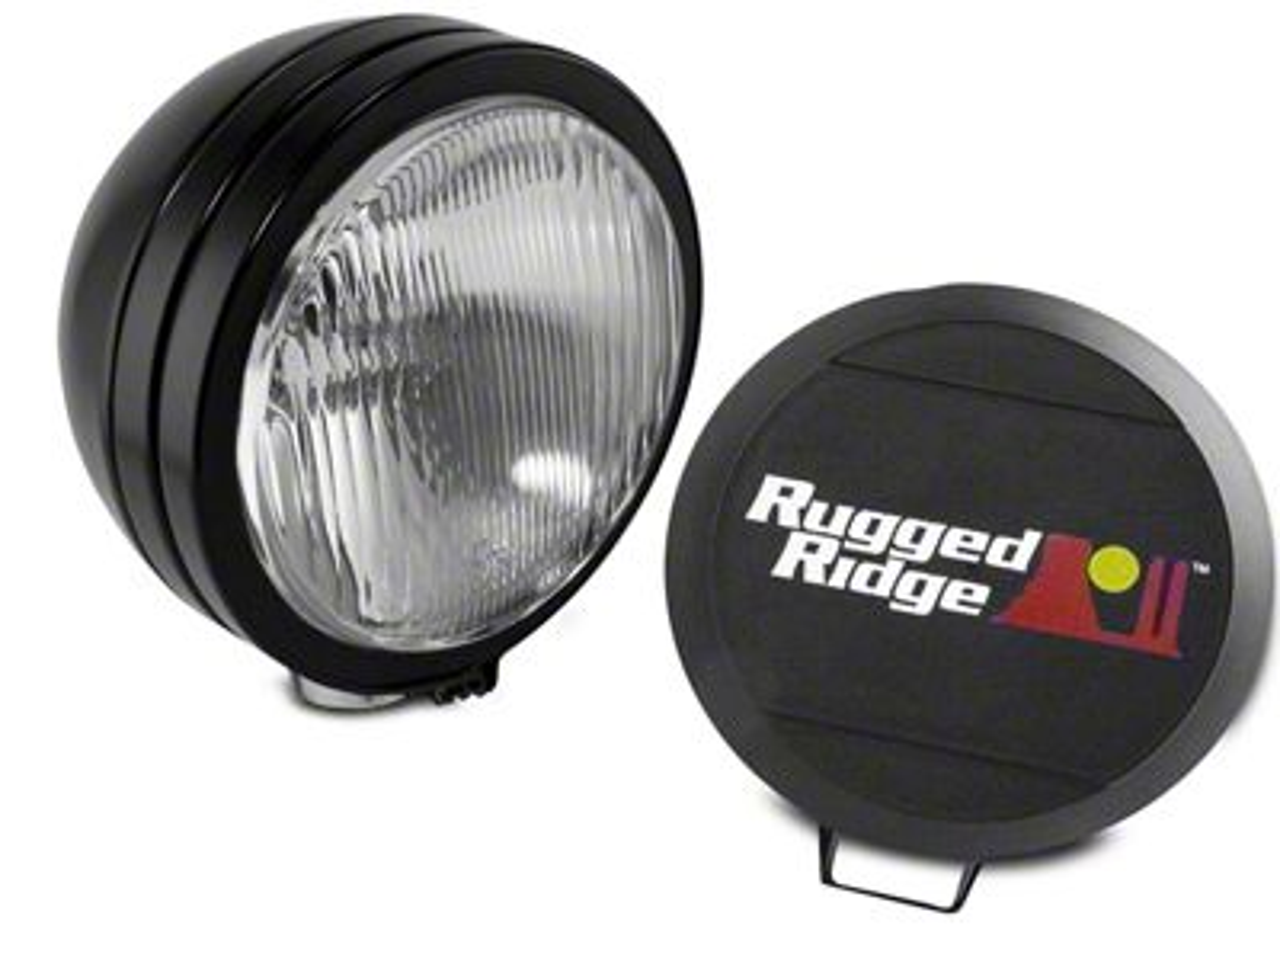 Rugged Ridge 5 in. Round HID Off-Road Fog Light w/ Black Steel Housing - Single (97-18 F-150)